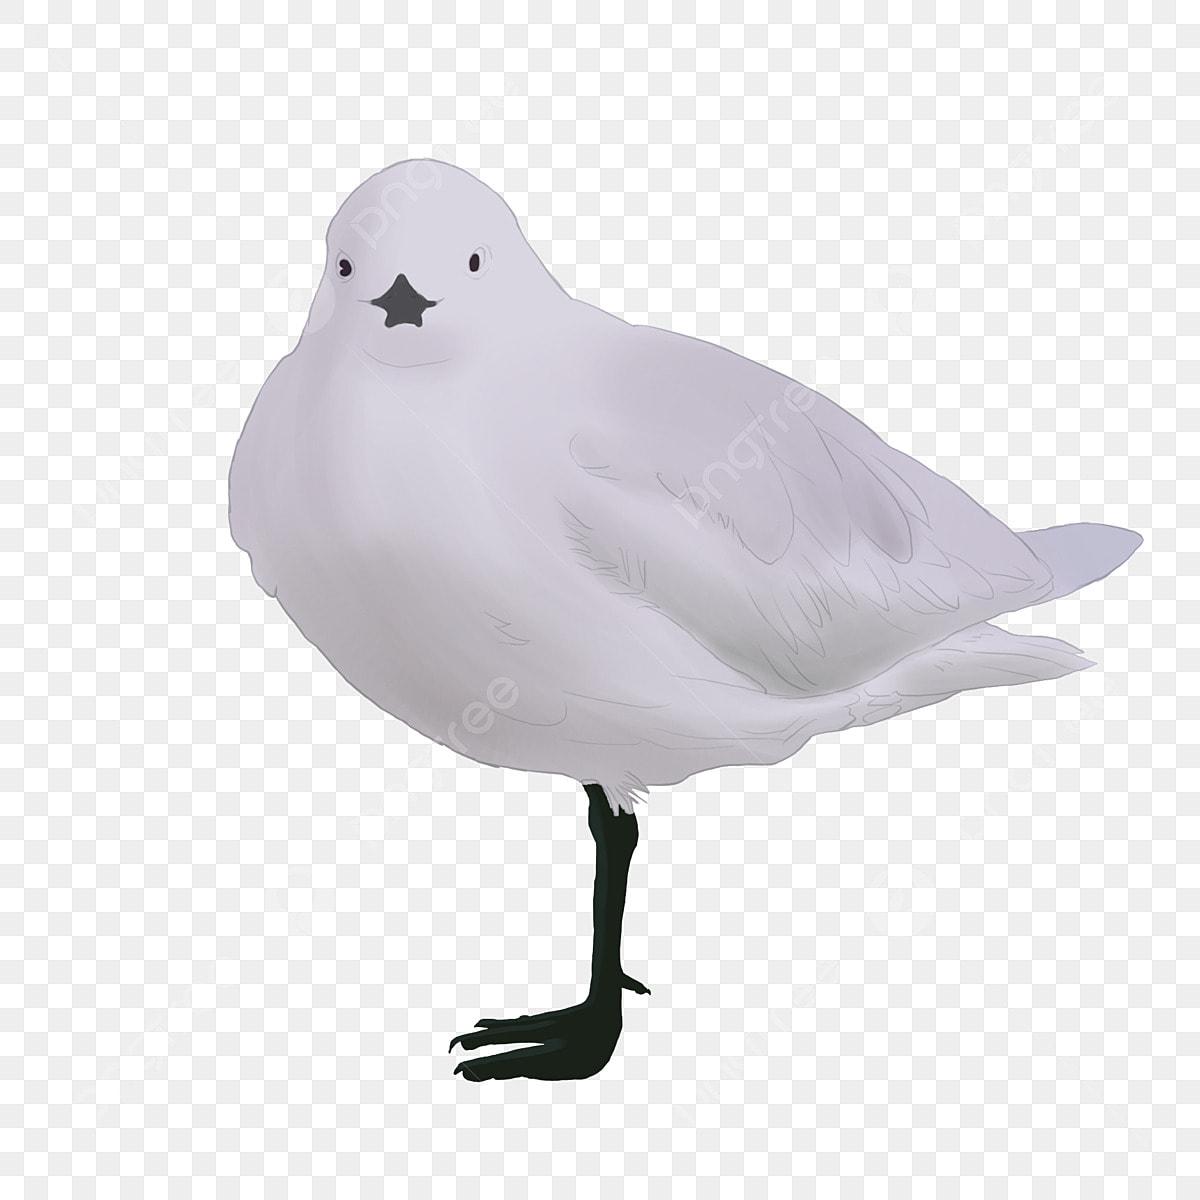 Berdiri Camar Camar Burung Haiwan Praktikal Seagull